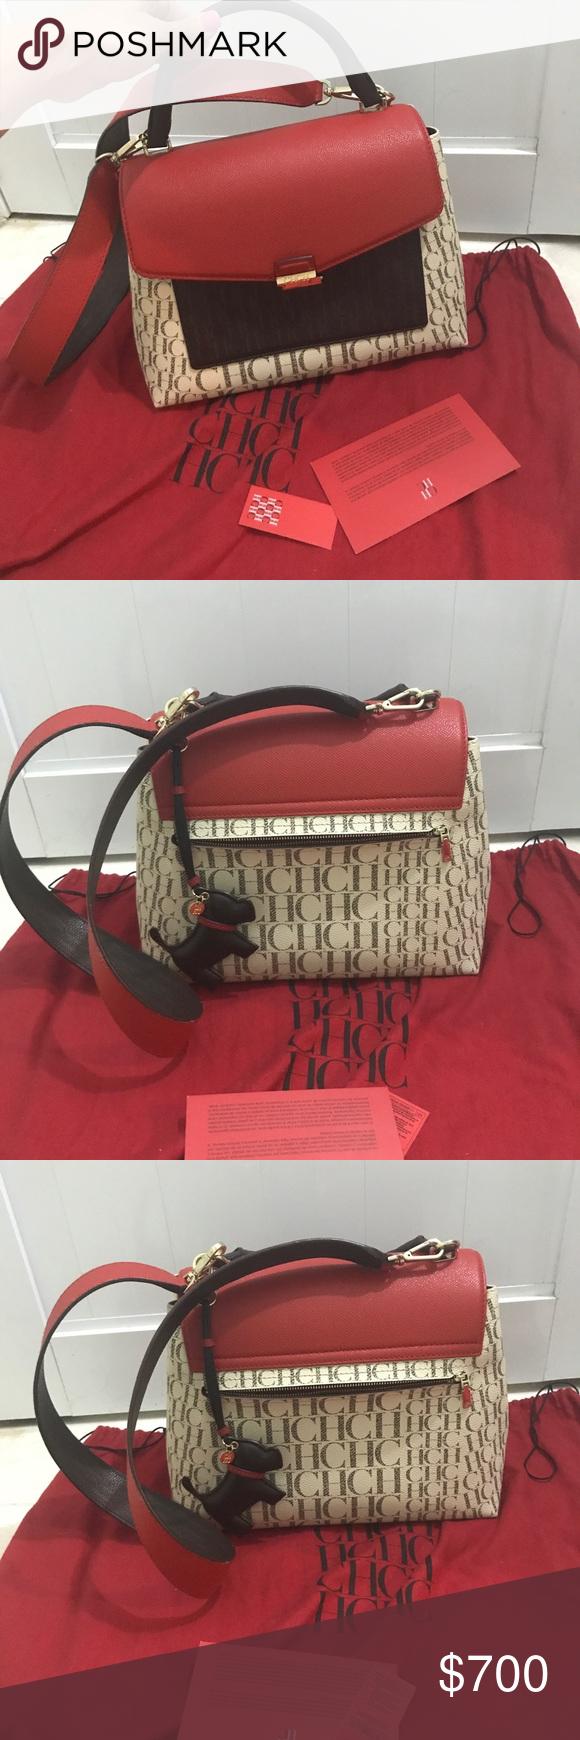 Carolina Herrera Minuetto Handbag Like new retail price 940+ taxes+ charm  this is a new model actually in CH stores Carolina Herrera Bags 0da75299247f8